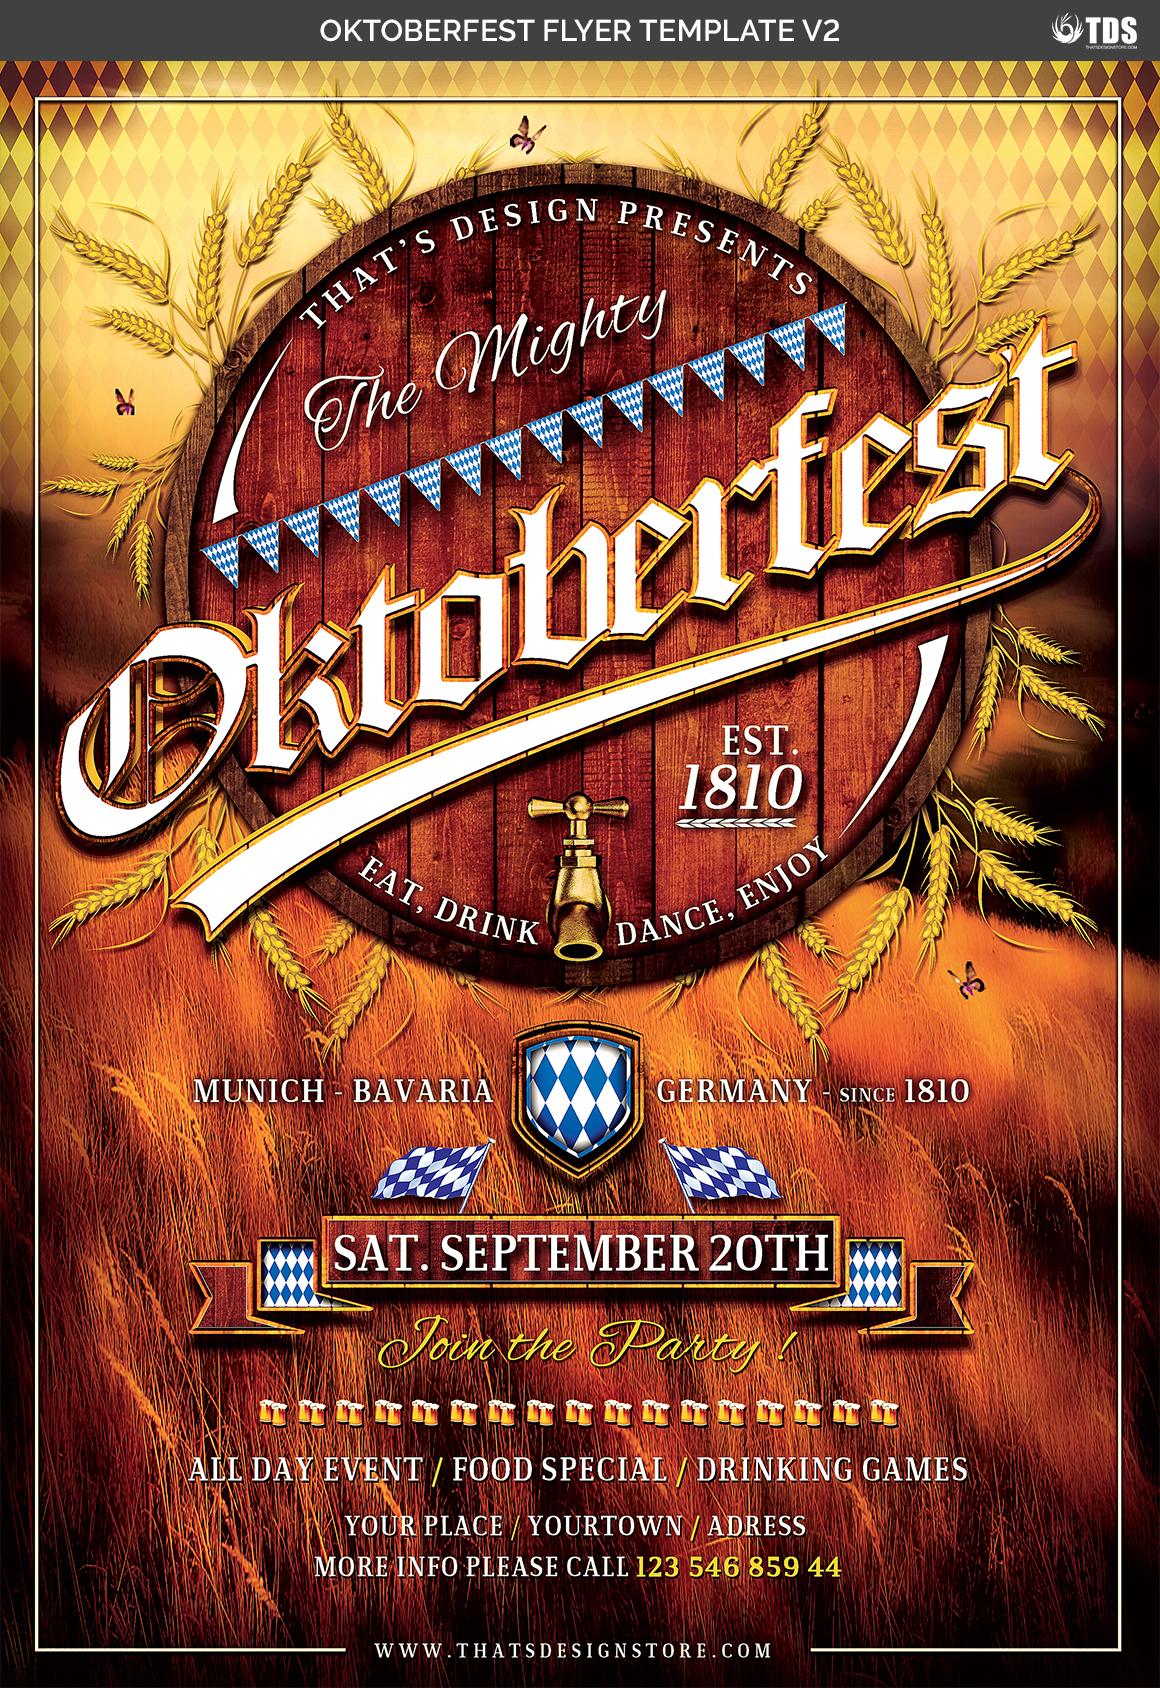 Oktoberfest Flyer Template V2 Example Image 2